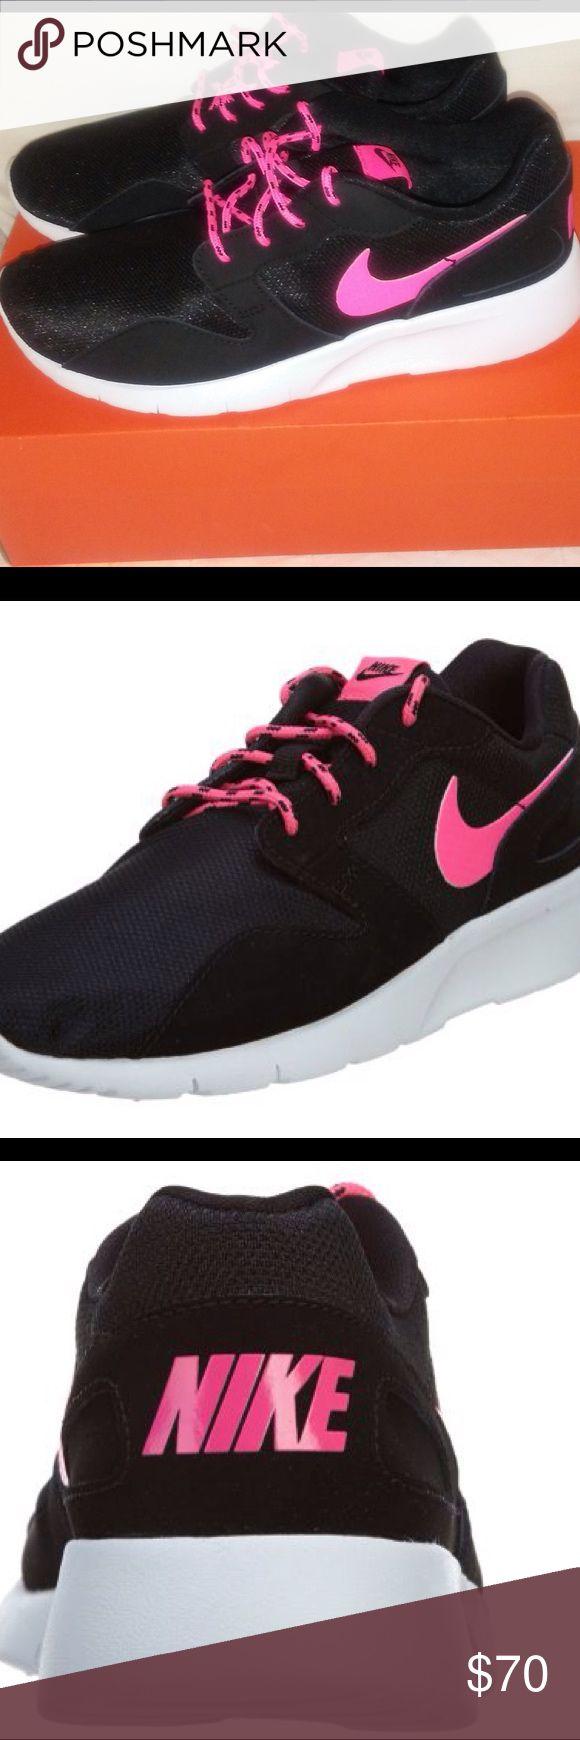 Nike Kaishi Black Pink Running Shoes Size 6.5 Nike Kaishi GS Black Pink Running Shoes Big Girls Nike Shoes Sneakers